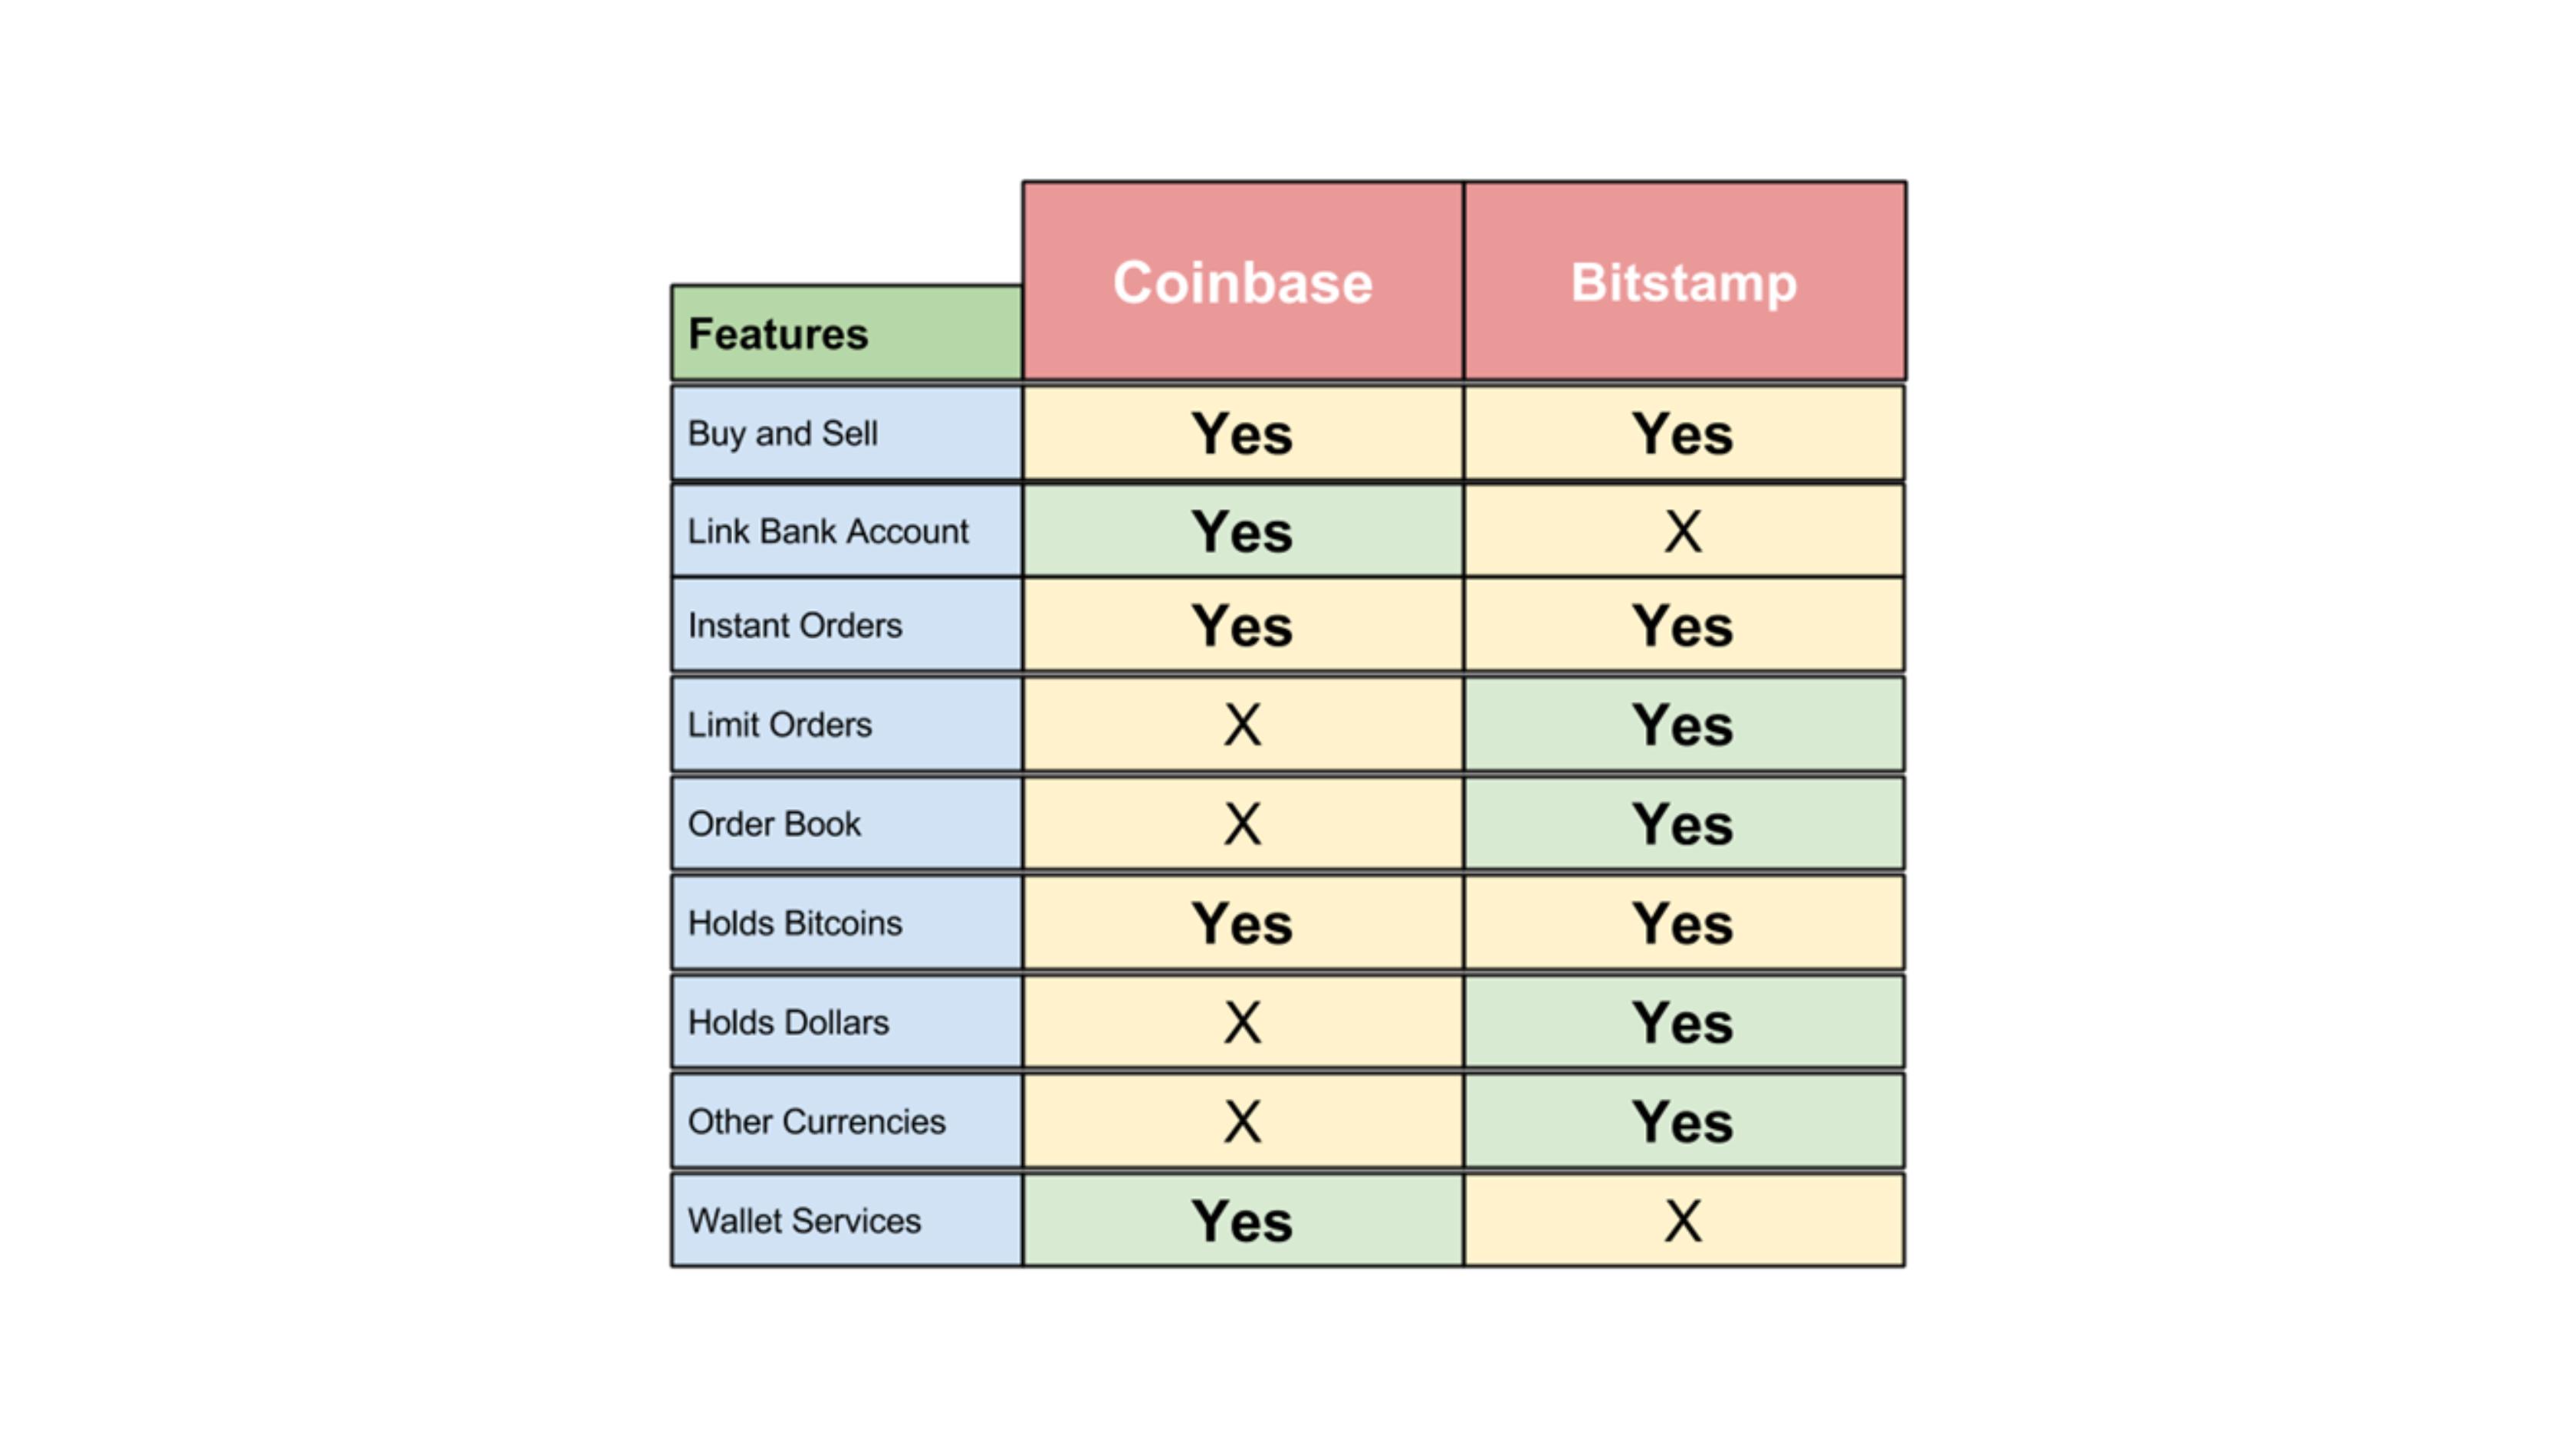 Coinbase vs Bitstamp: furnizorii de Bitcoin s-au comparat